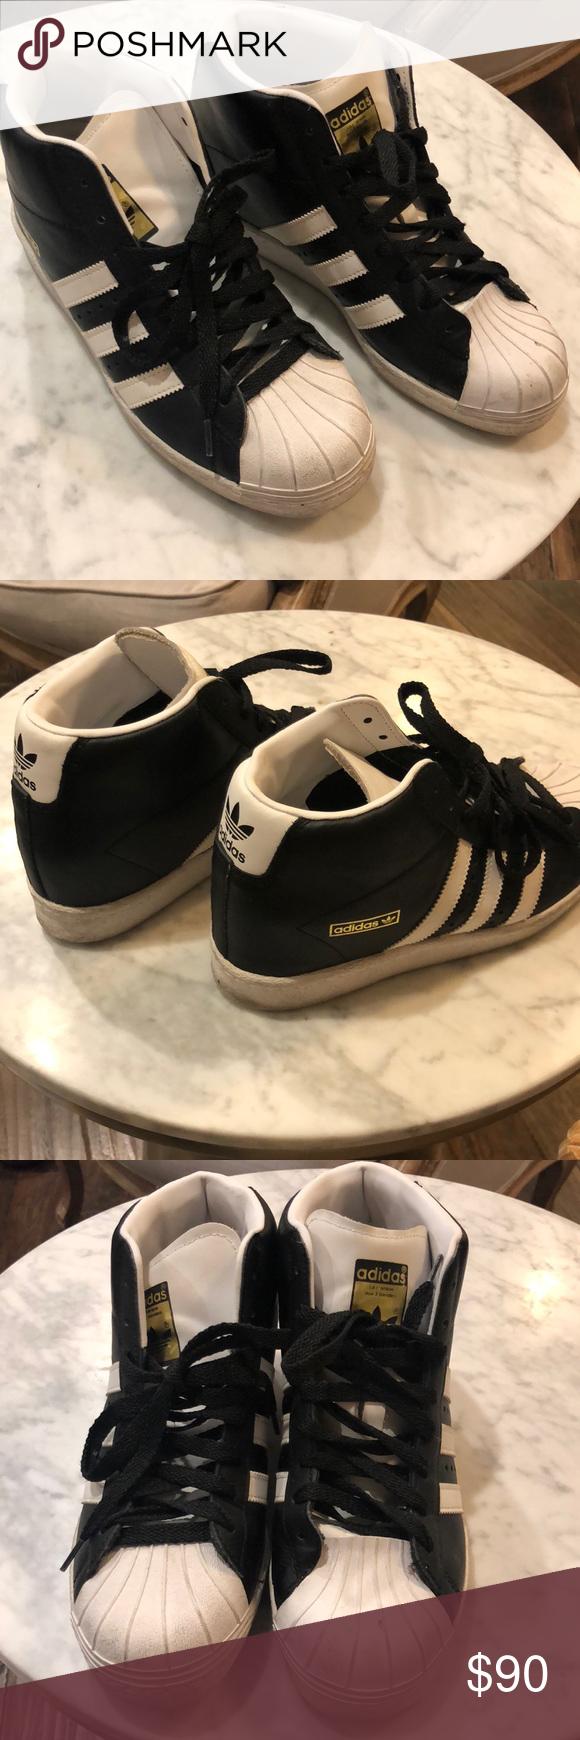 Adidas superstar high top sneaker black white Adidas